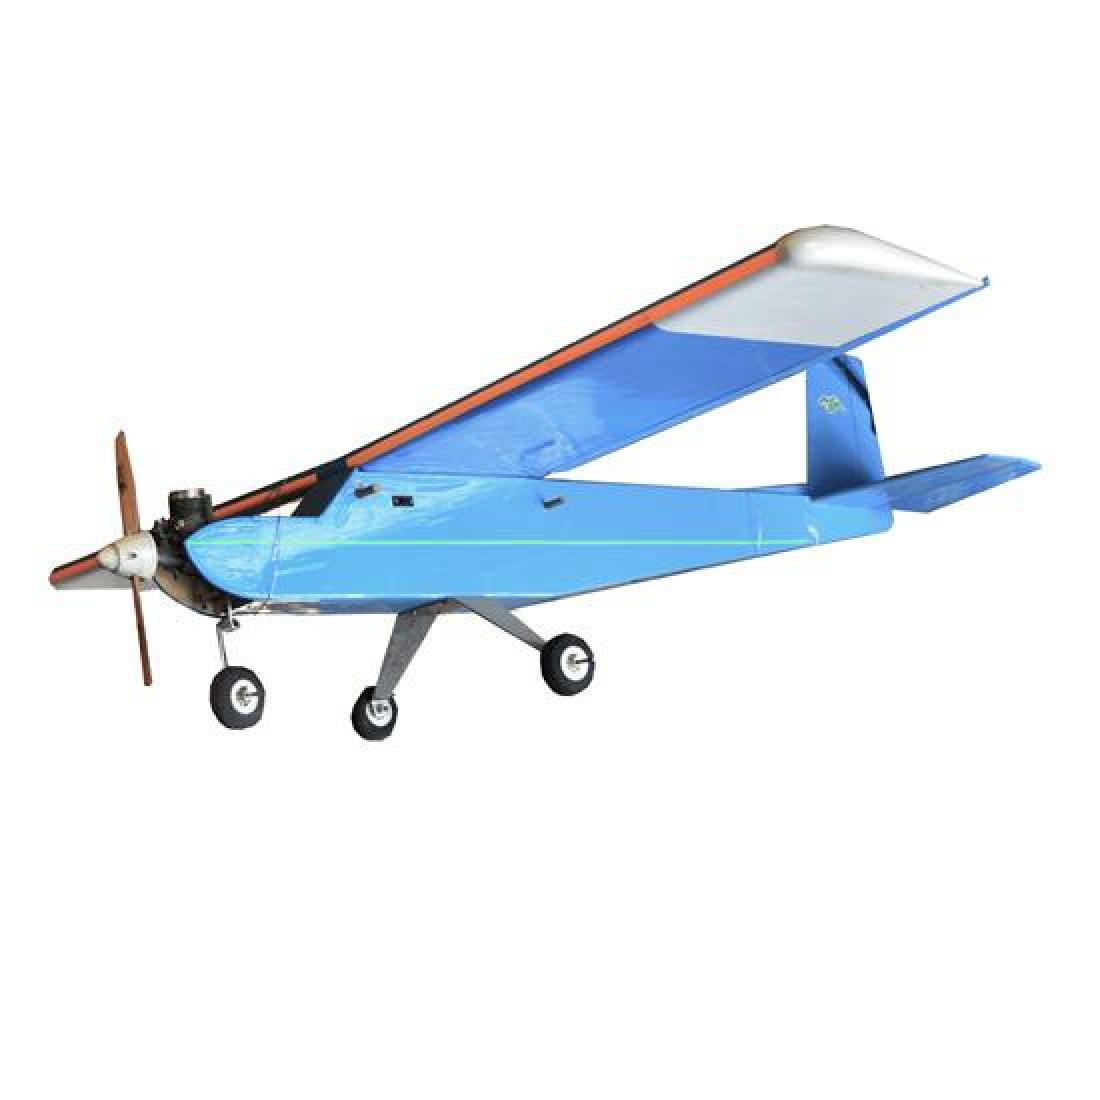 "A Remote Control Airplane 48"" W x 56"" D x 20"" H"